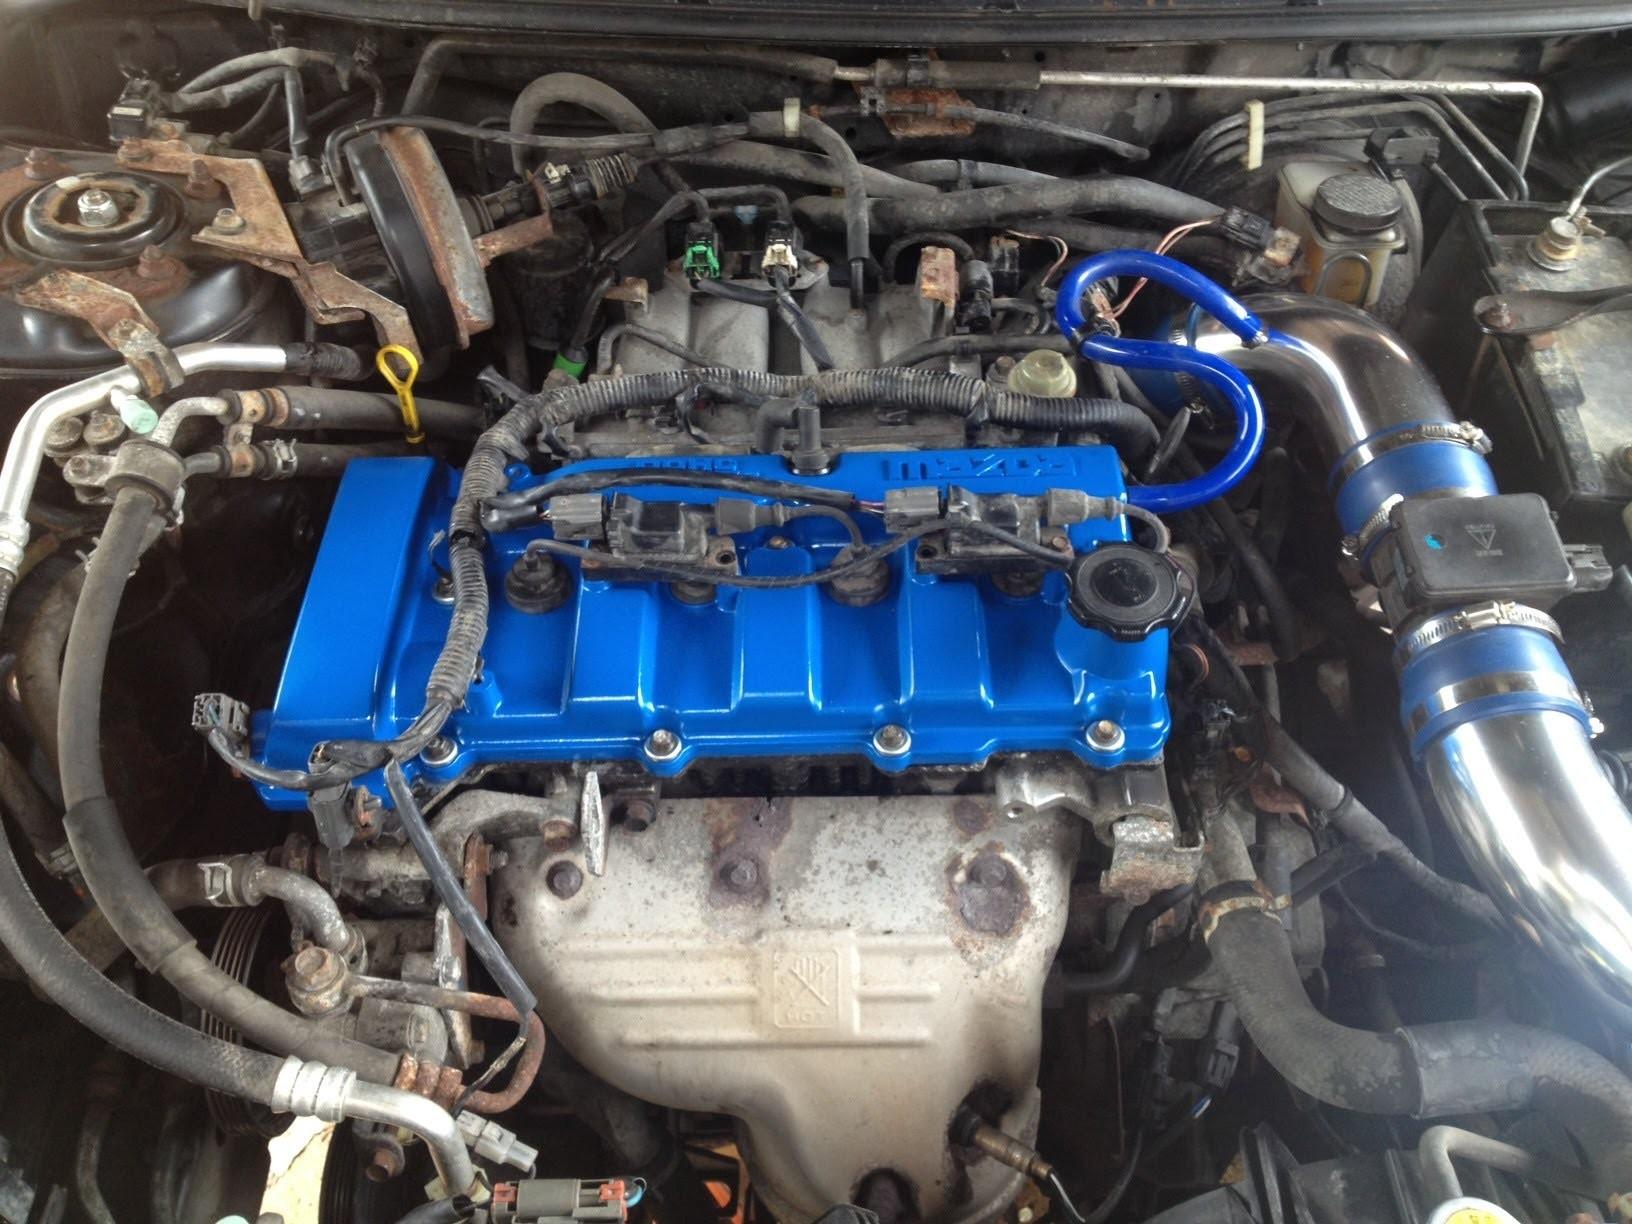 2002 Mazda Protege Engine Diagram Mazda Protege Timing Belt Water Pump How  to Of 2002 Mazda